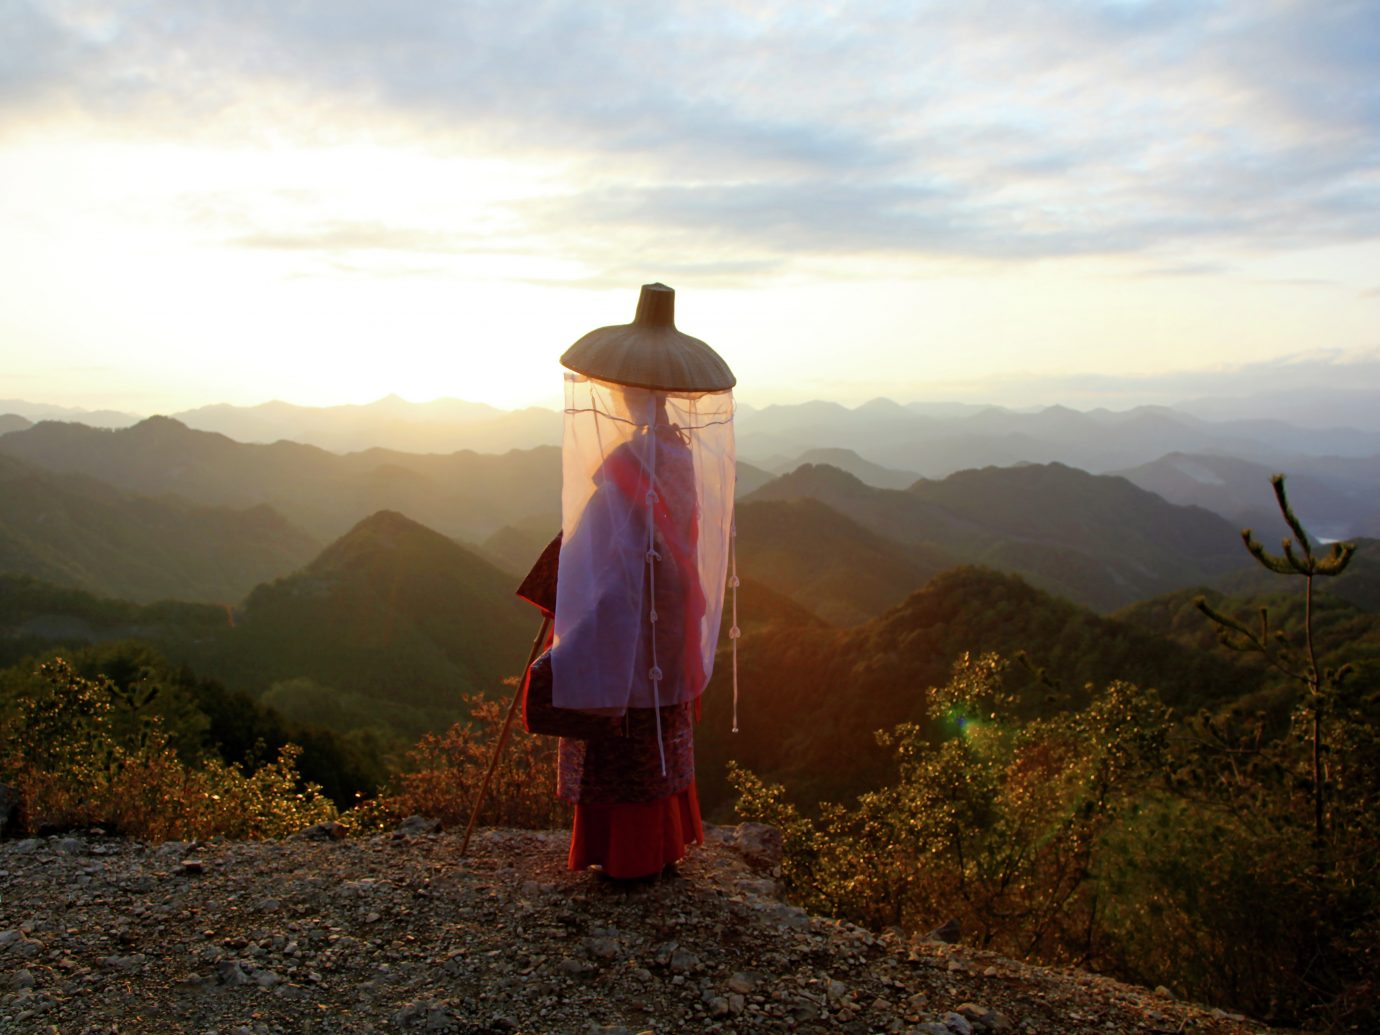 woman on top of mountain, REI Adventures Japan Hiking – Kumano Kodo & Nakasendo